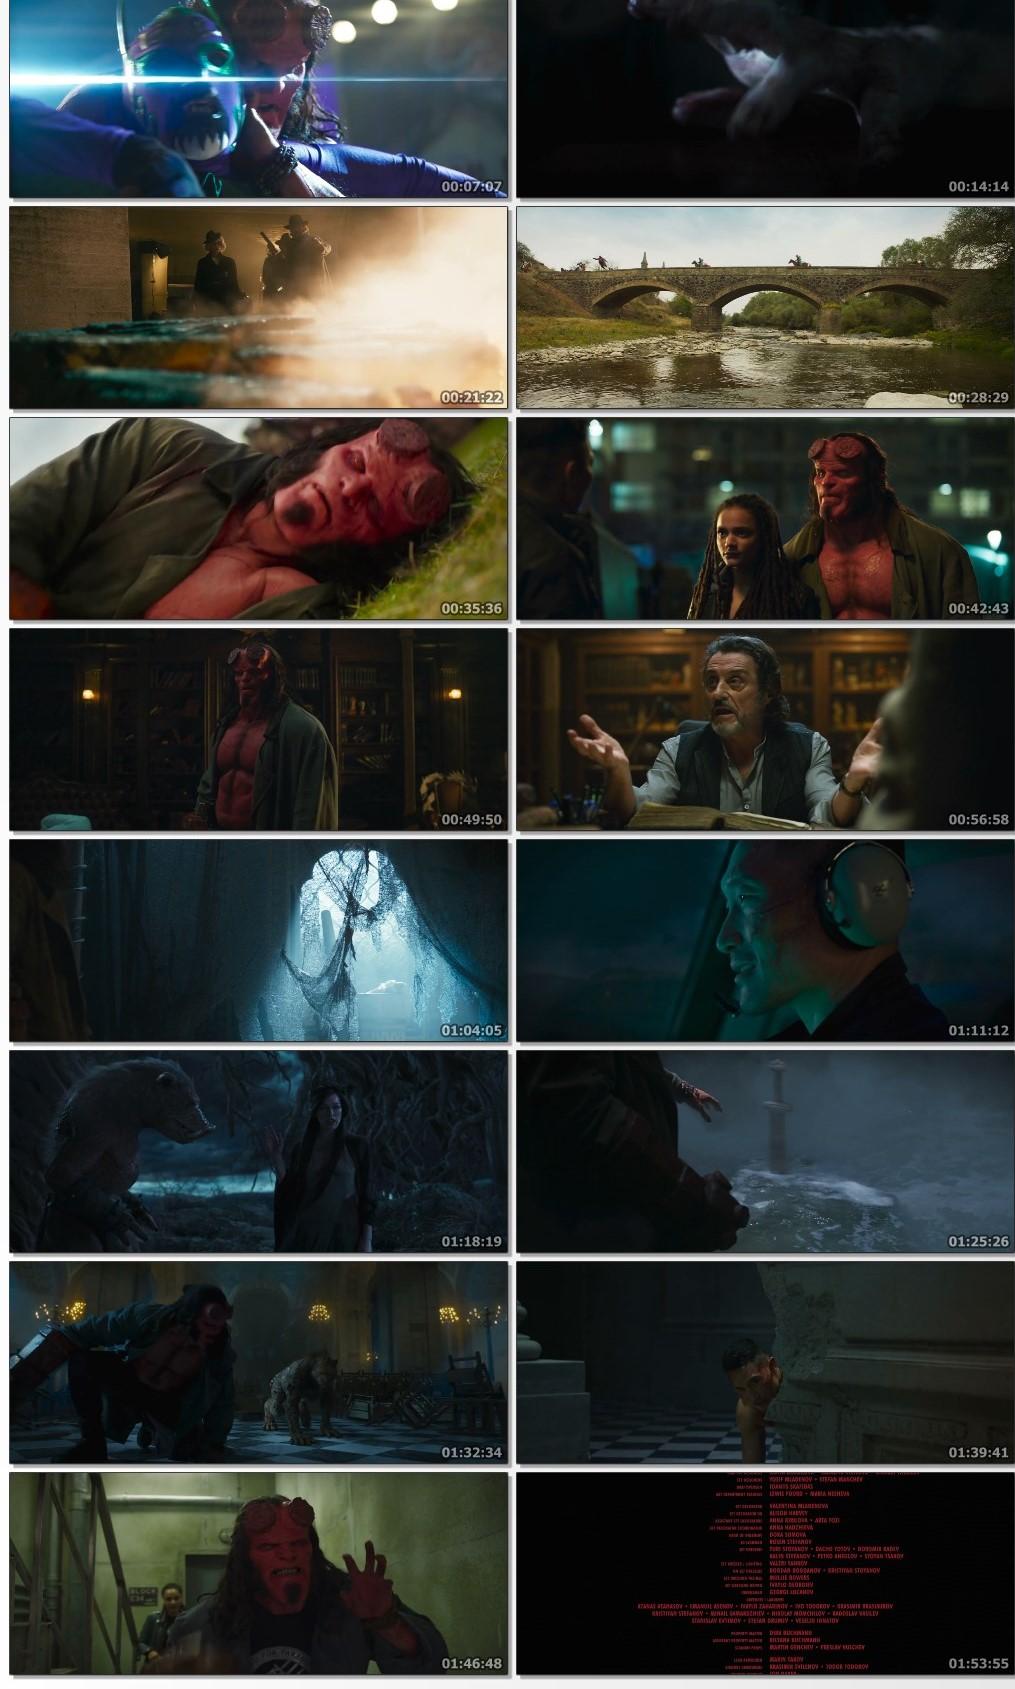 Hellboy-2019-www-9kmovies-work-Hindi-ORG-Dual-Audio-720p-Blu-Ray-ESub-1-2-GB-mkv-thumbs484c2c911985c